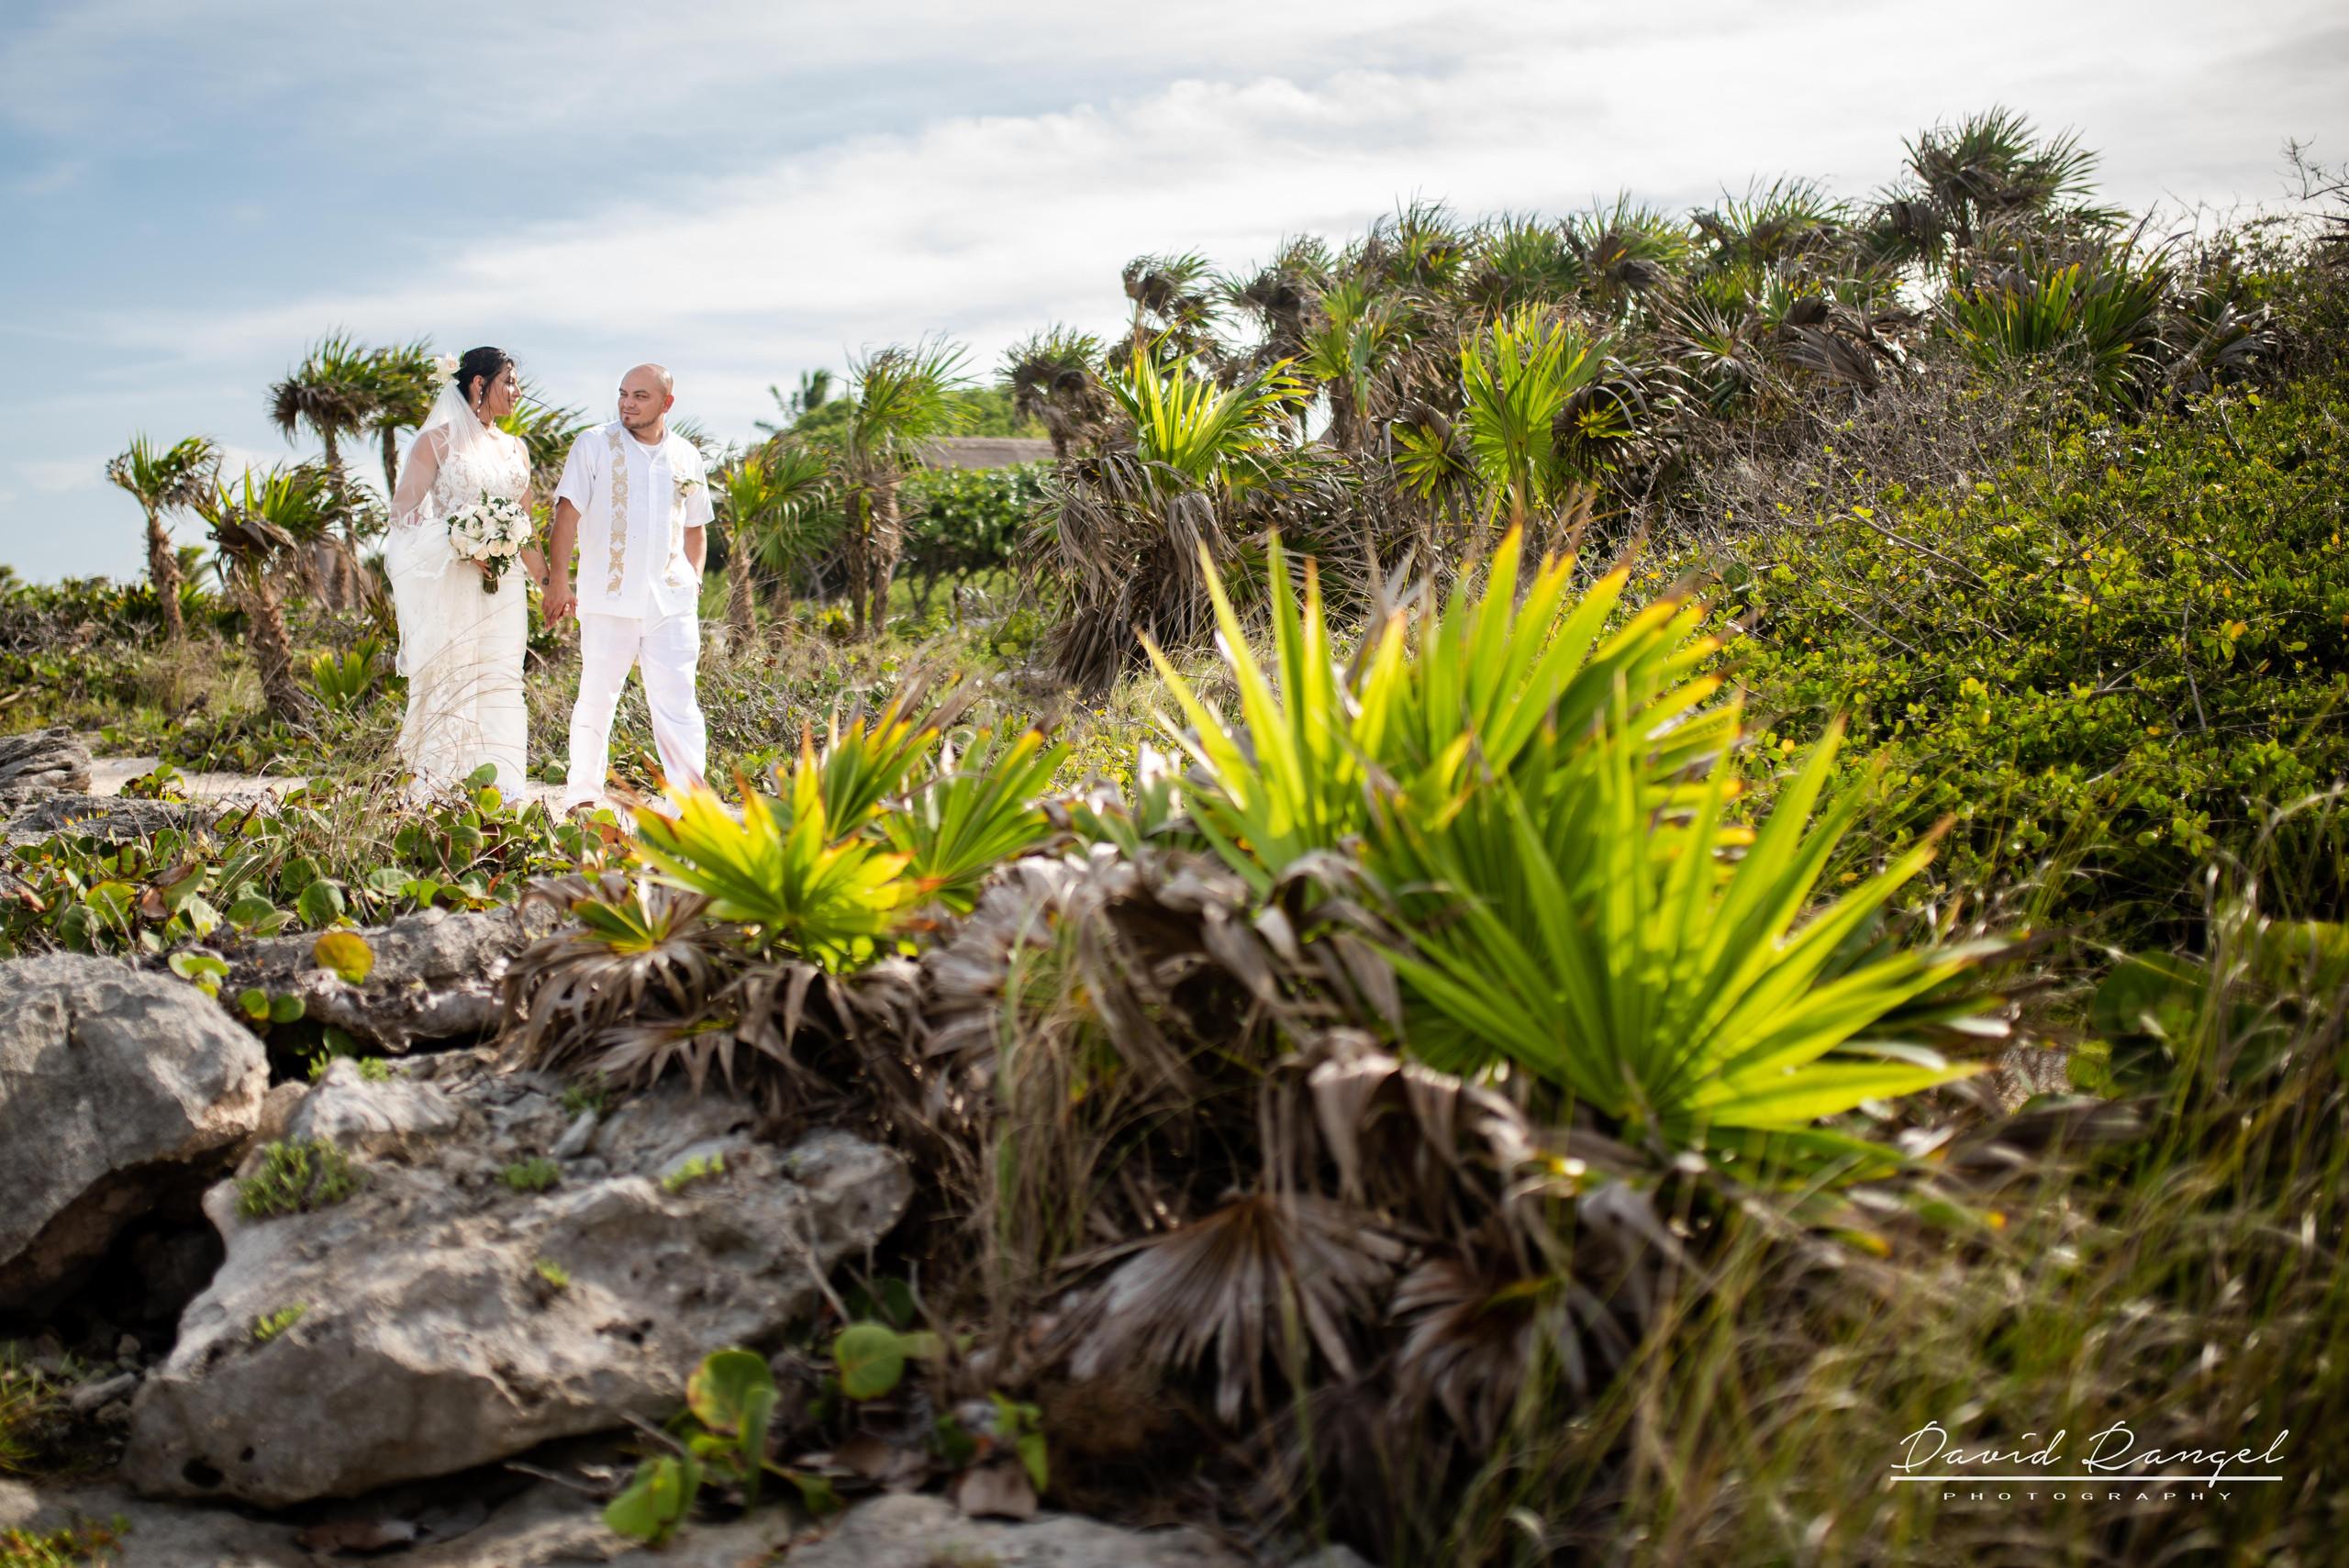 bride+groom+rocks+beach+riviera+maya+palm+trees+wedding+coverage+photo+bouquet+love+union+celebration+nature+caribean+sea+walk